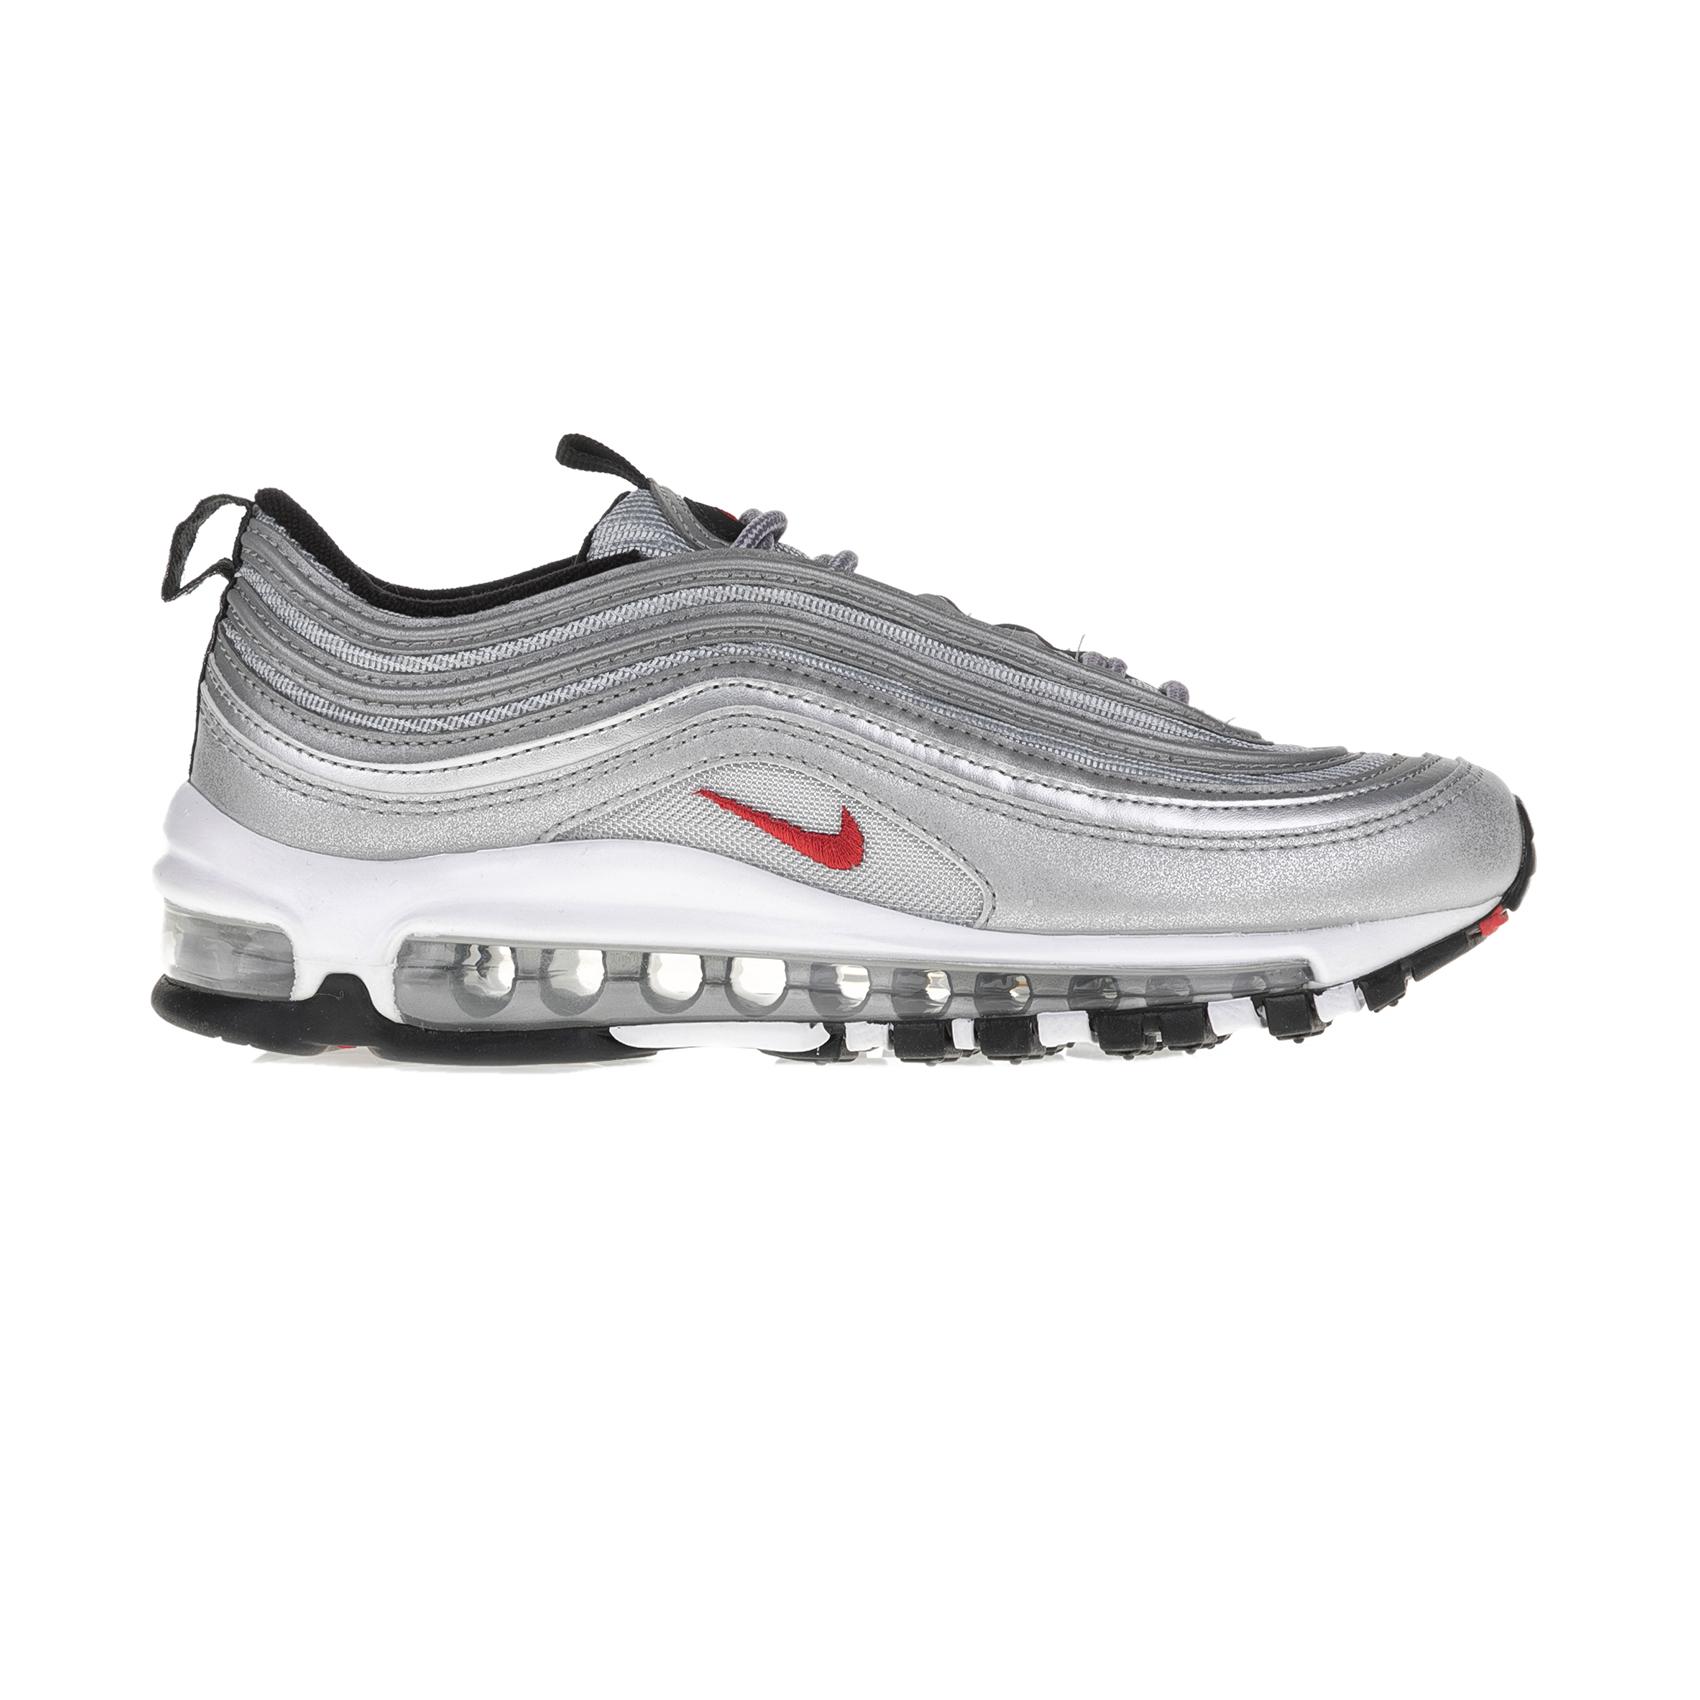 NIKE – Παιδικά αθλητικά παπούτσια Nike AIR MAX 97 QS (GS) ασημί